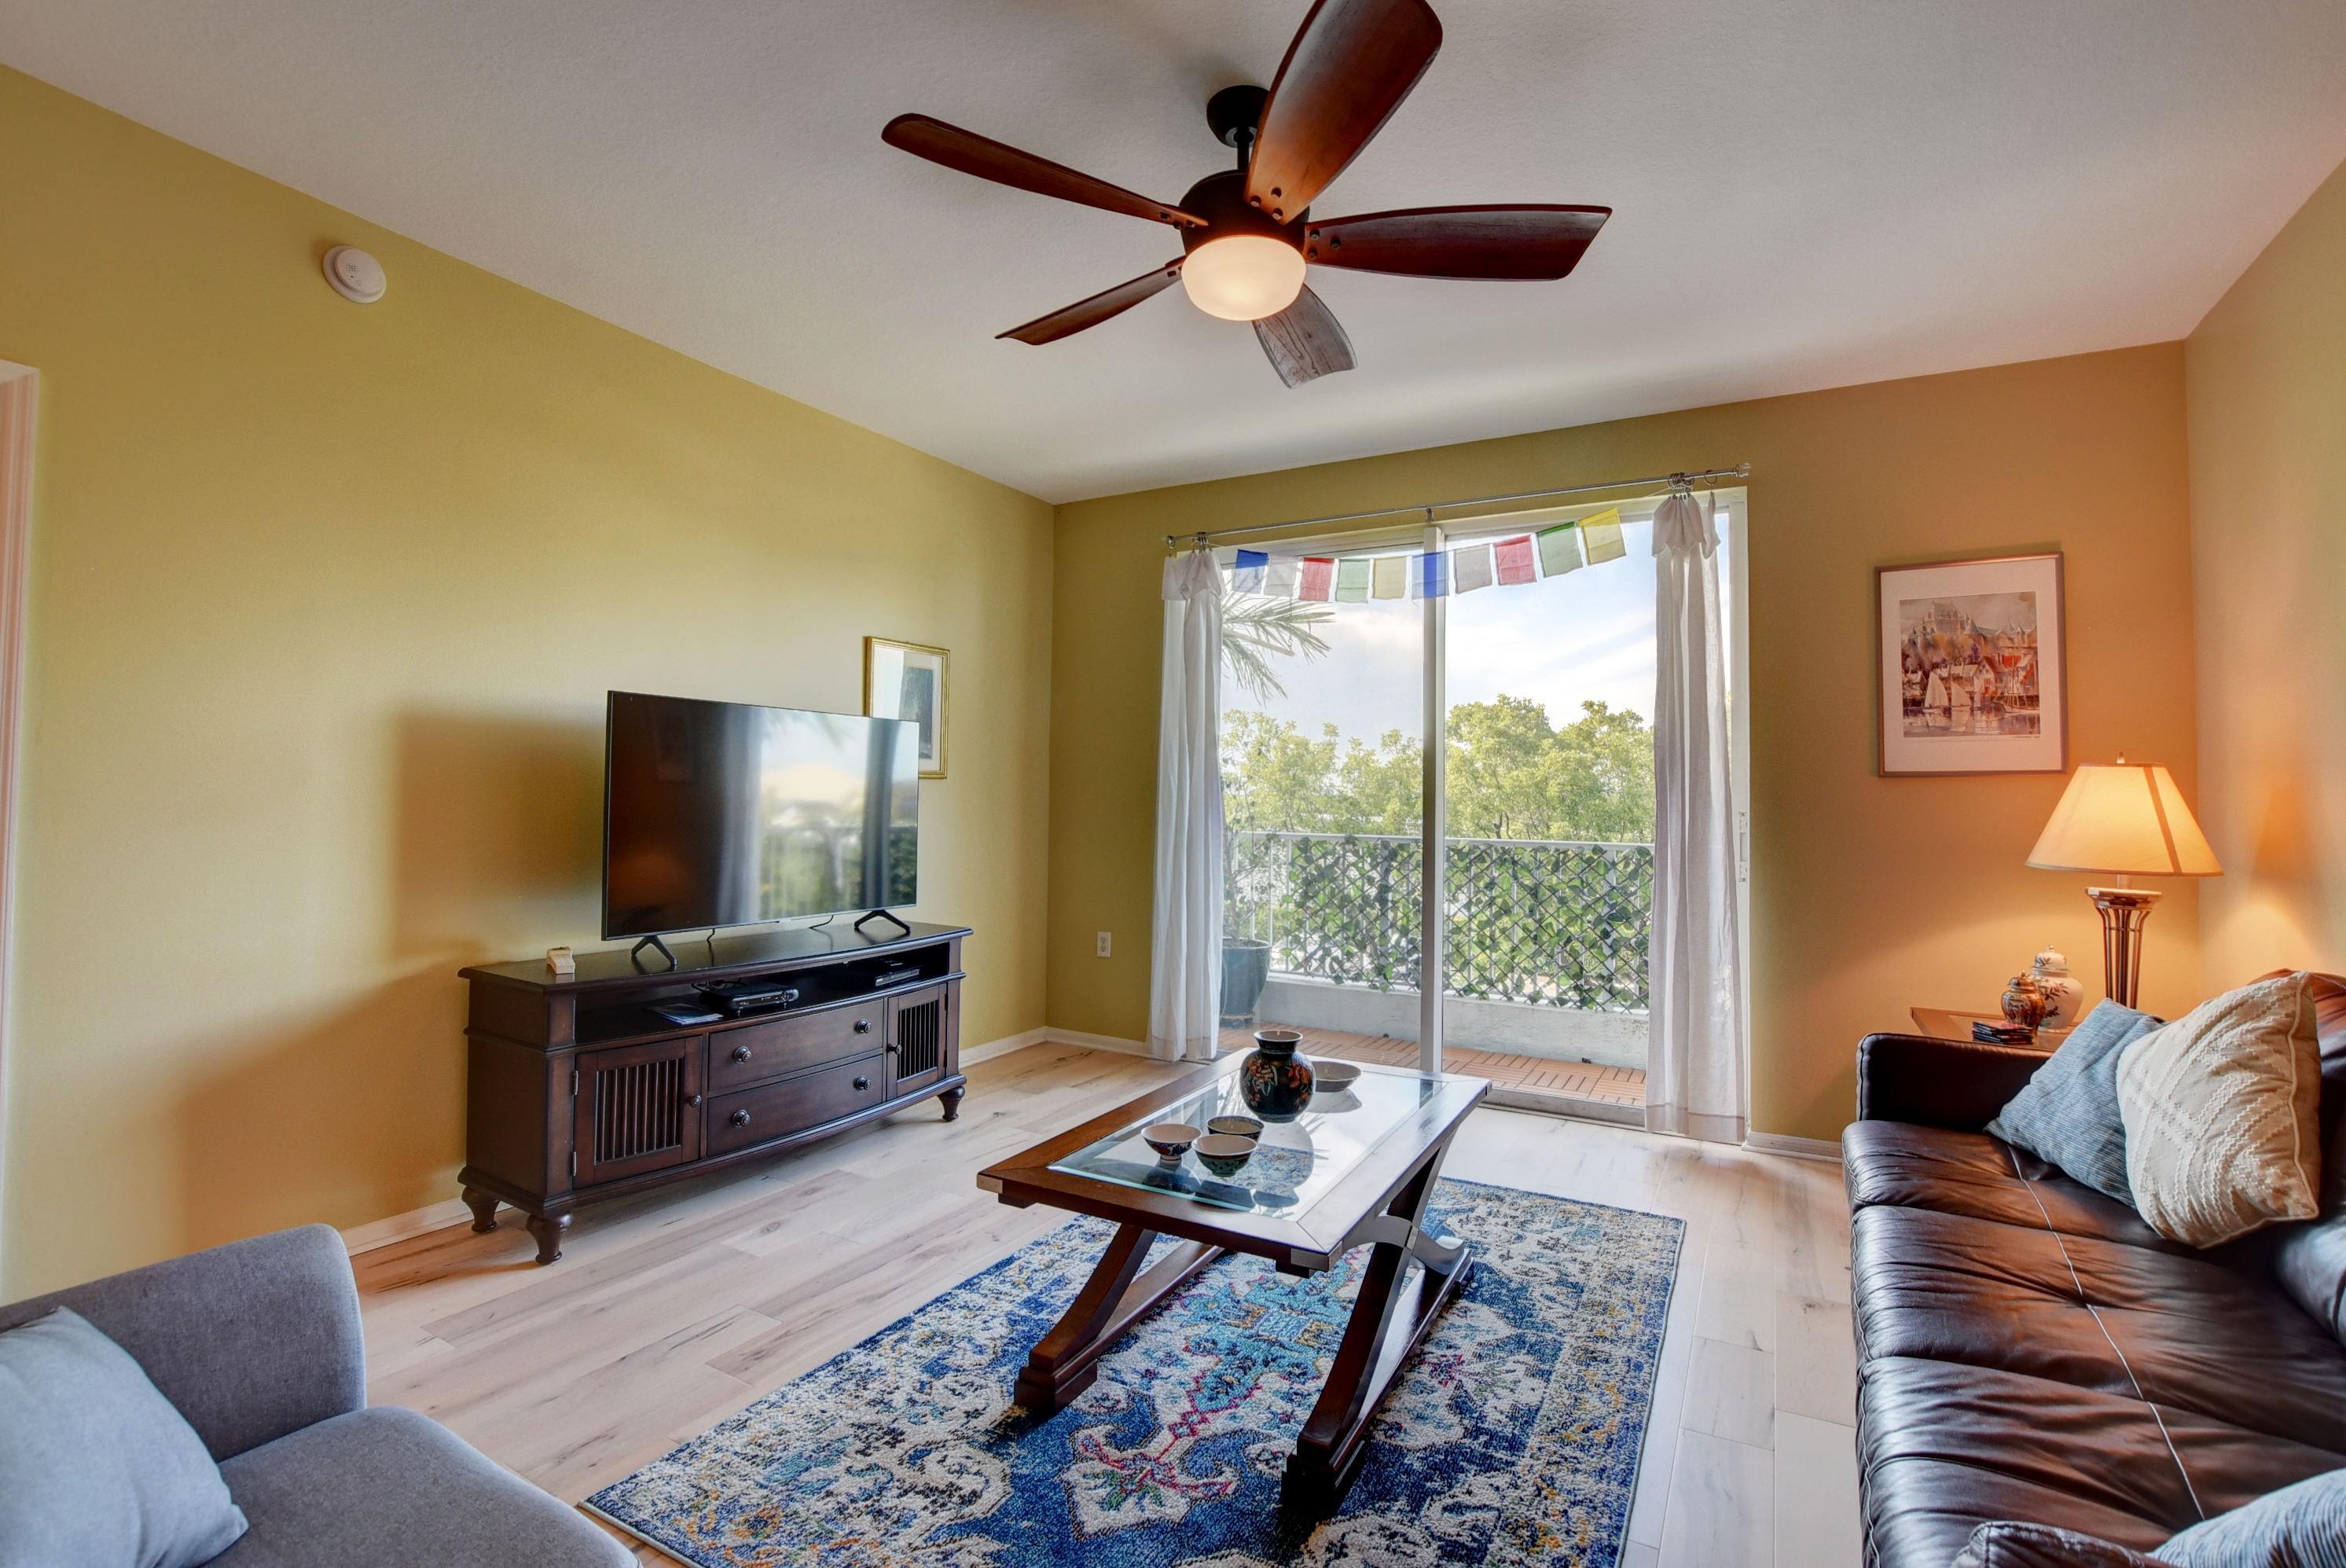 2.4 Living room